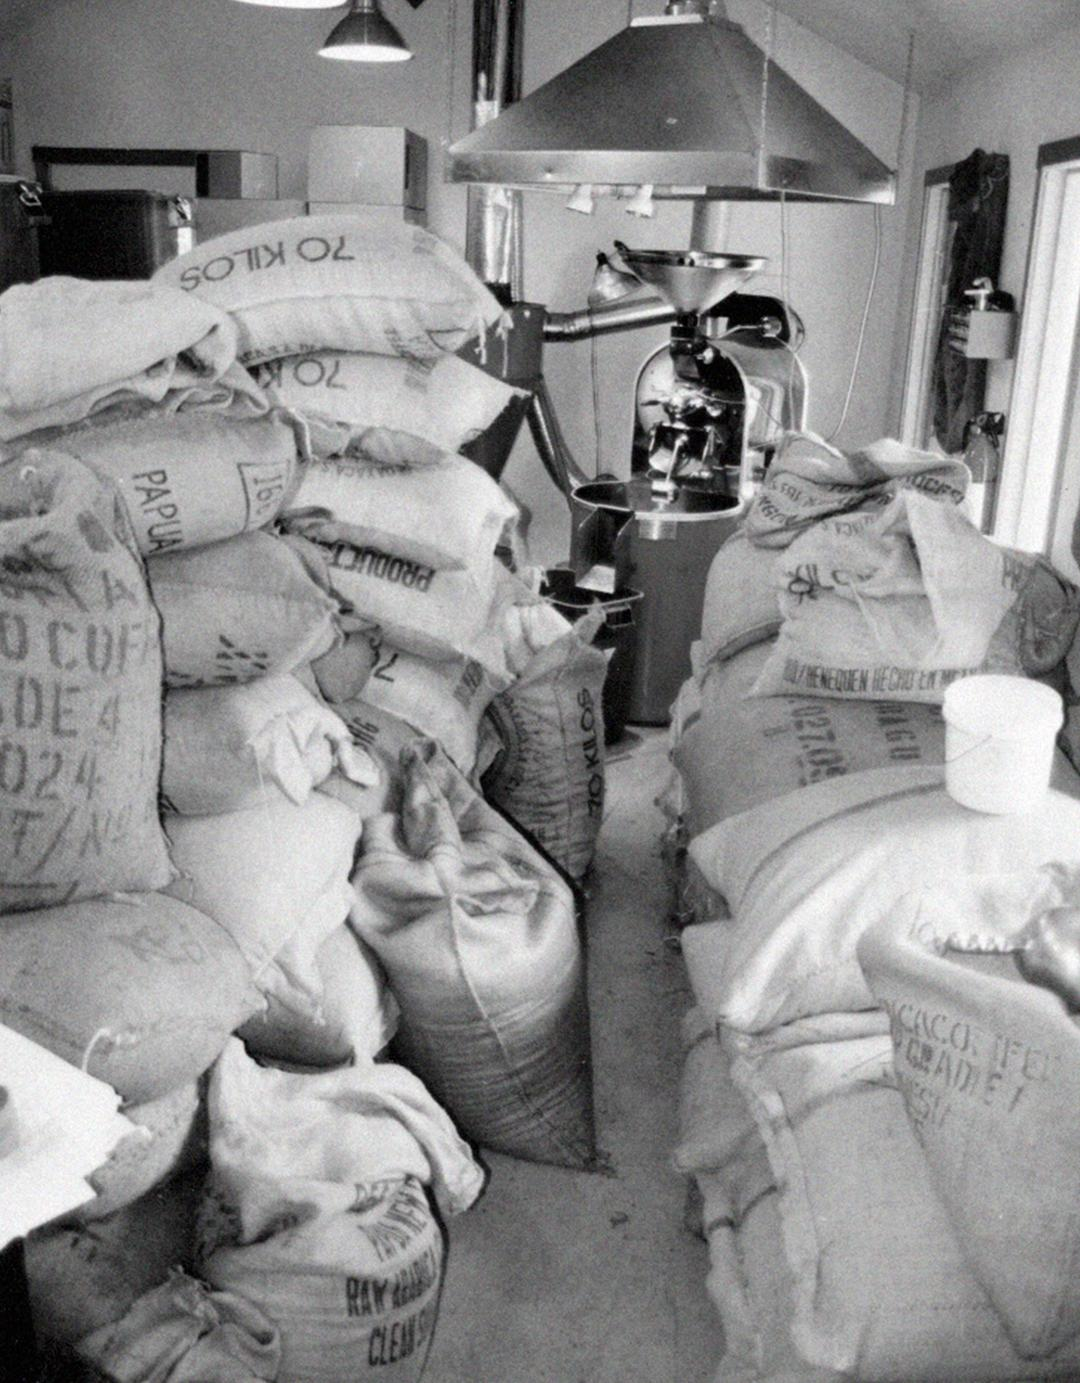 Large sacks of coffee